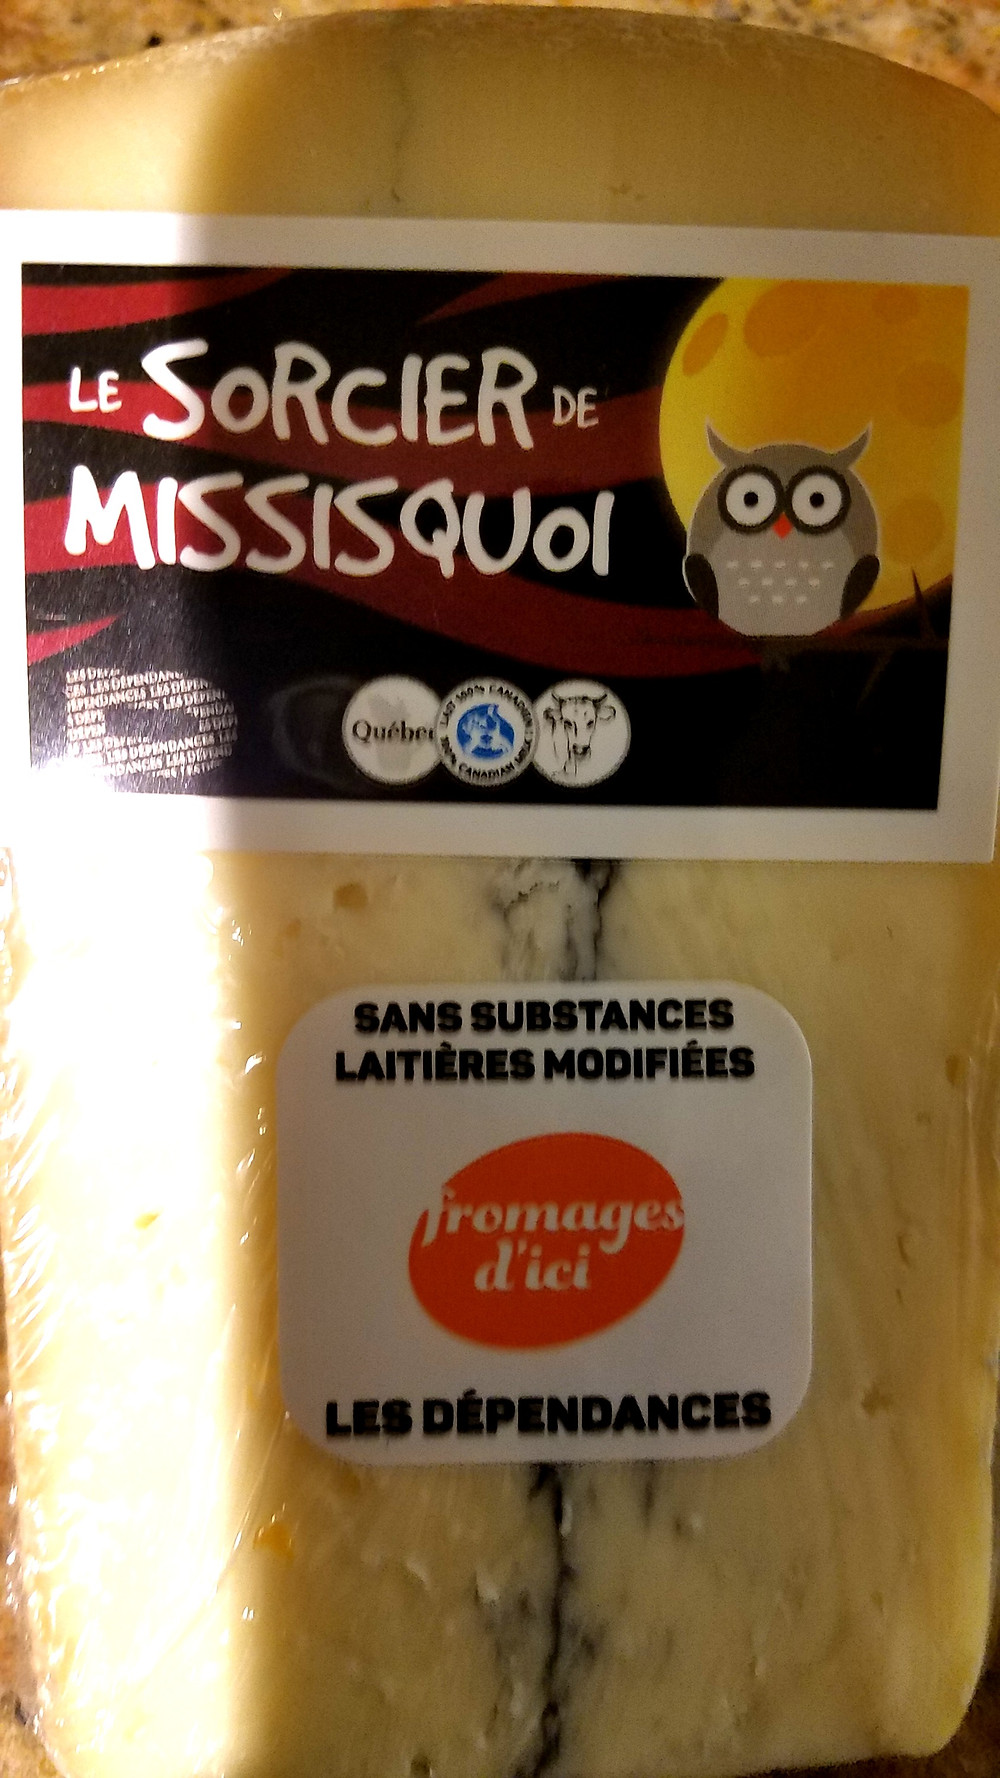 Traveleidoscope: Le Sorcier de Missisquoi morbier cheese